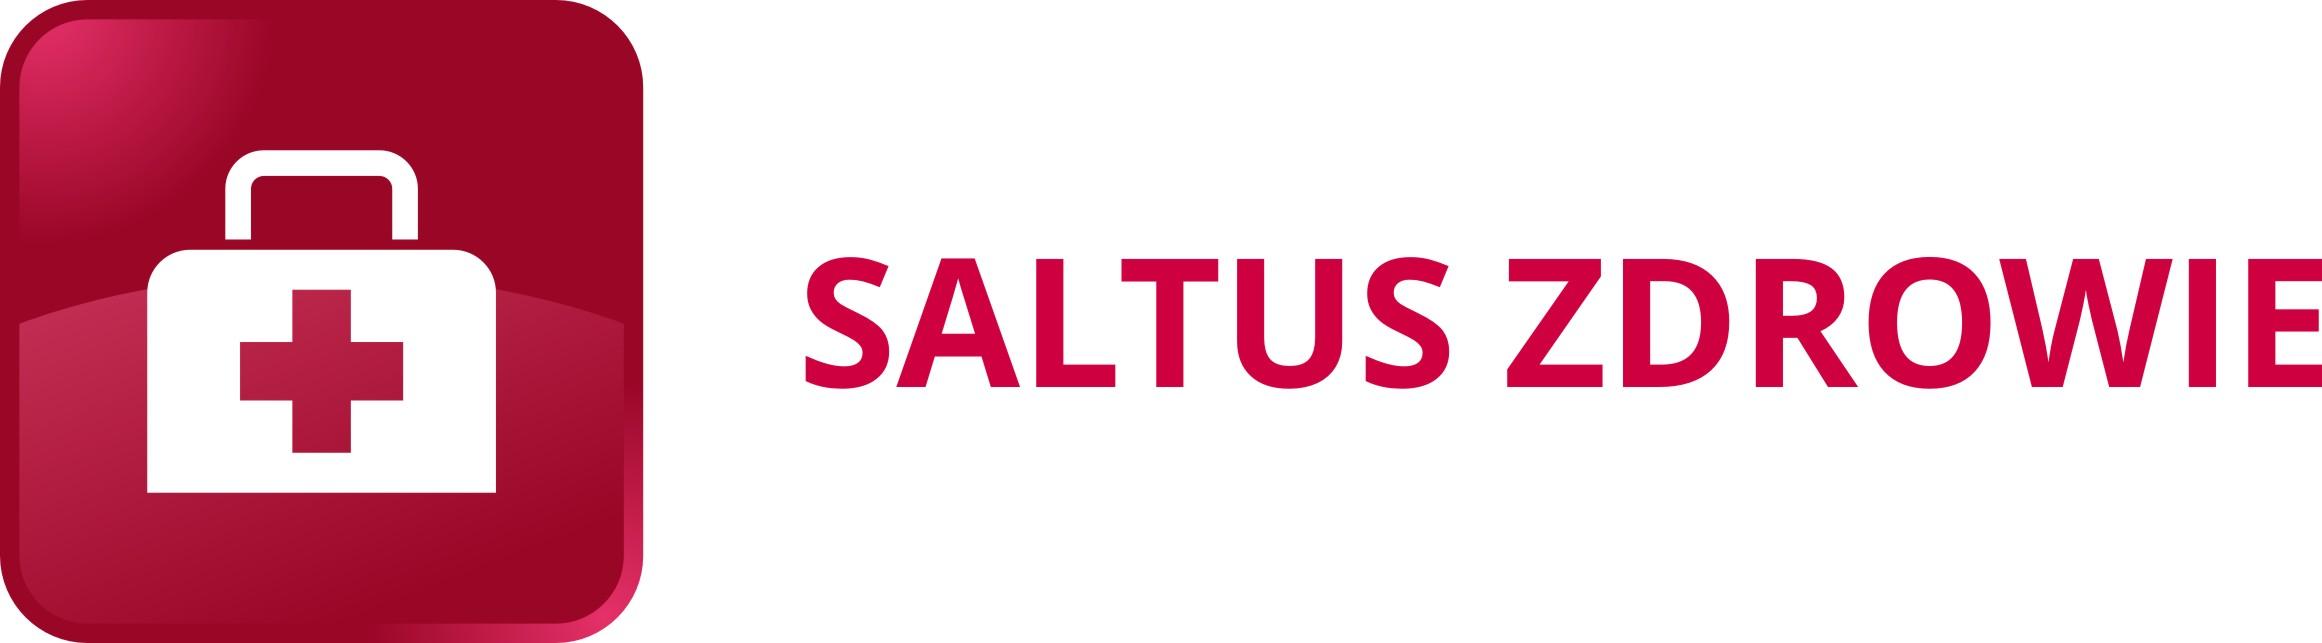 SALTUS ZDROWIE